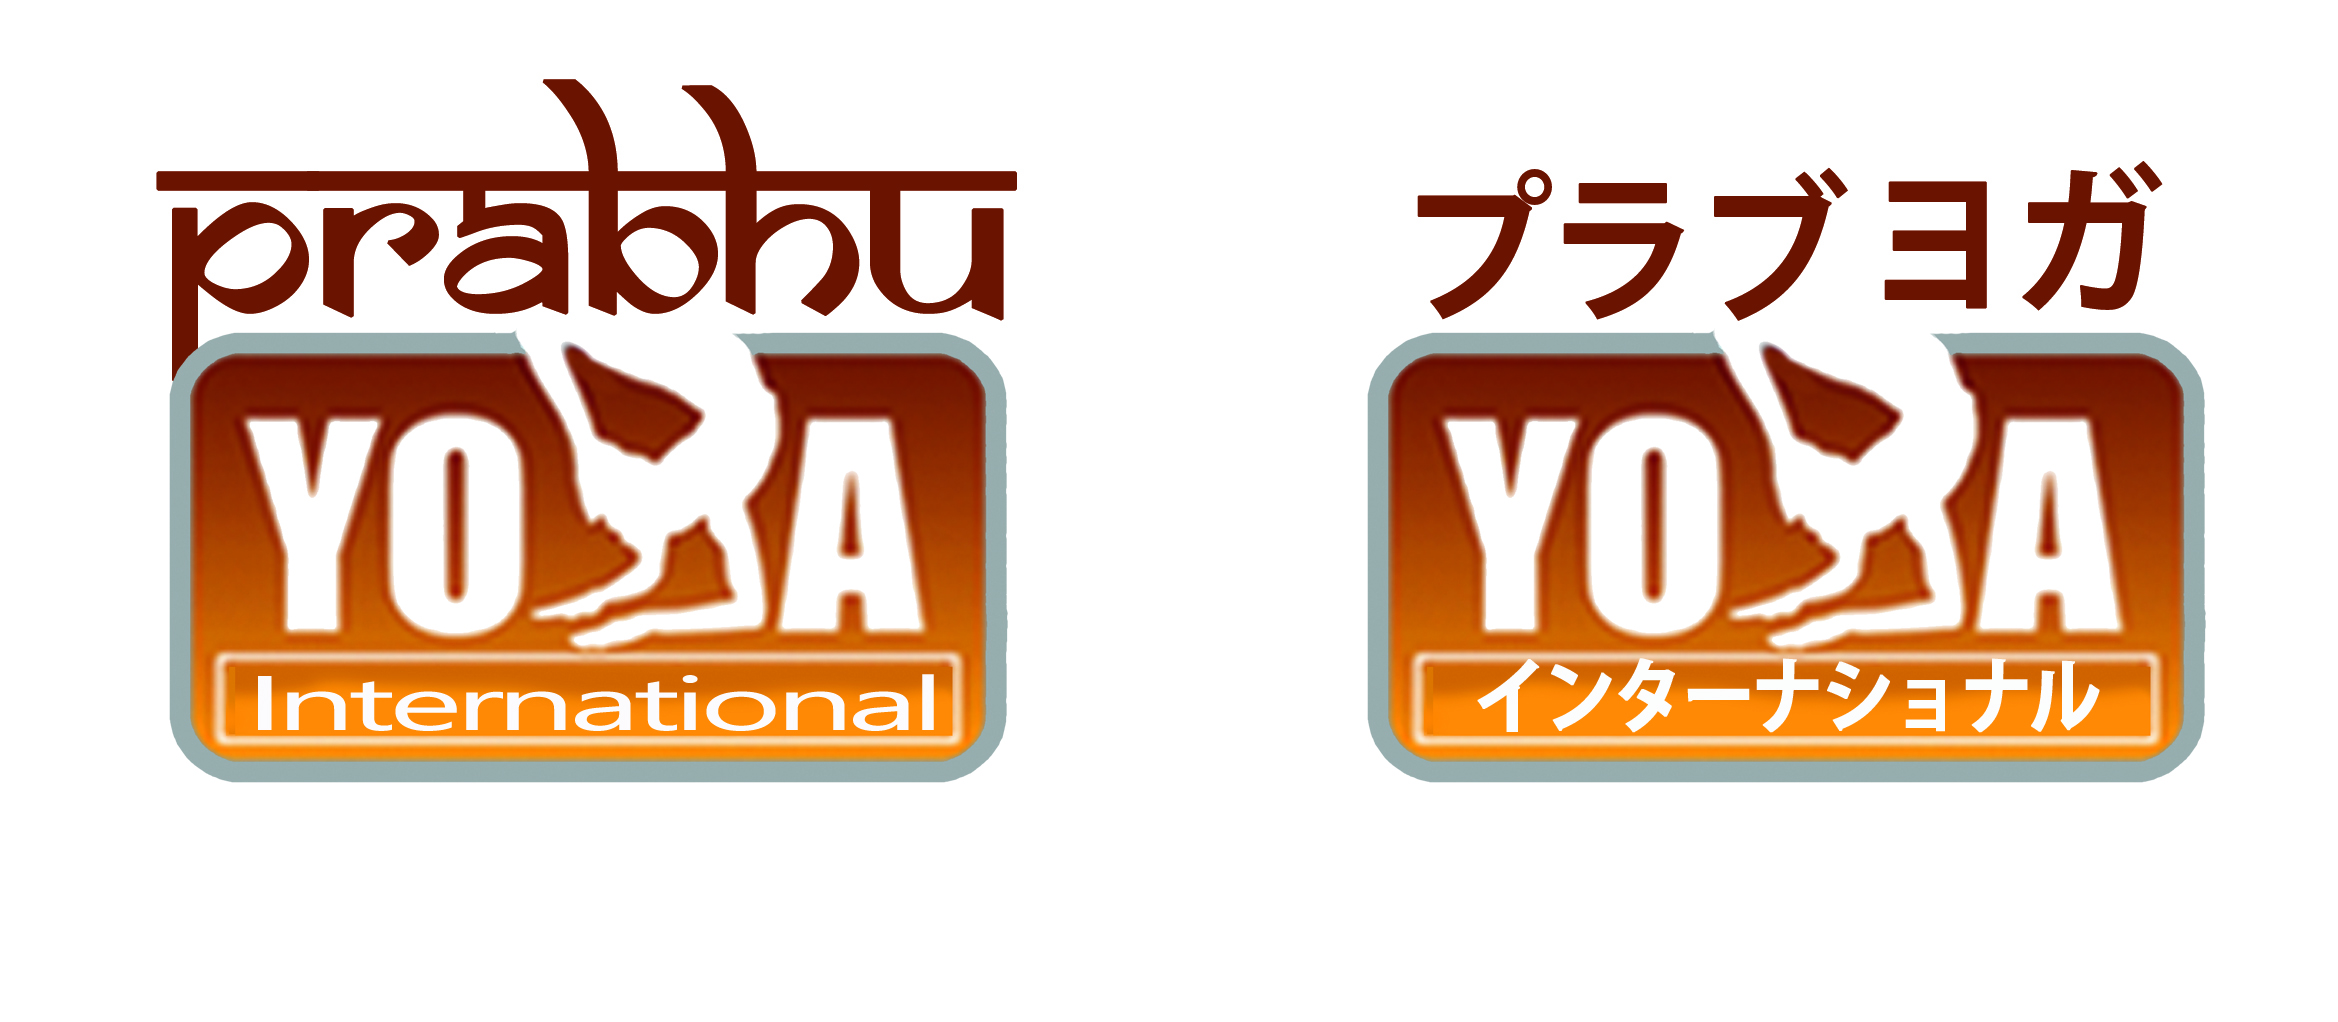 PrabhuYoga.co.jp